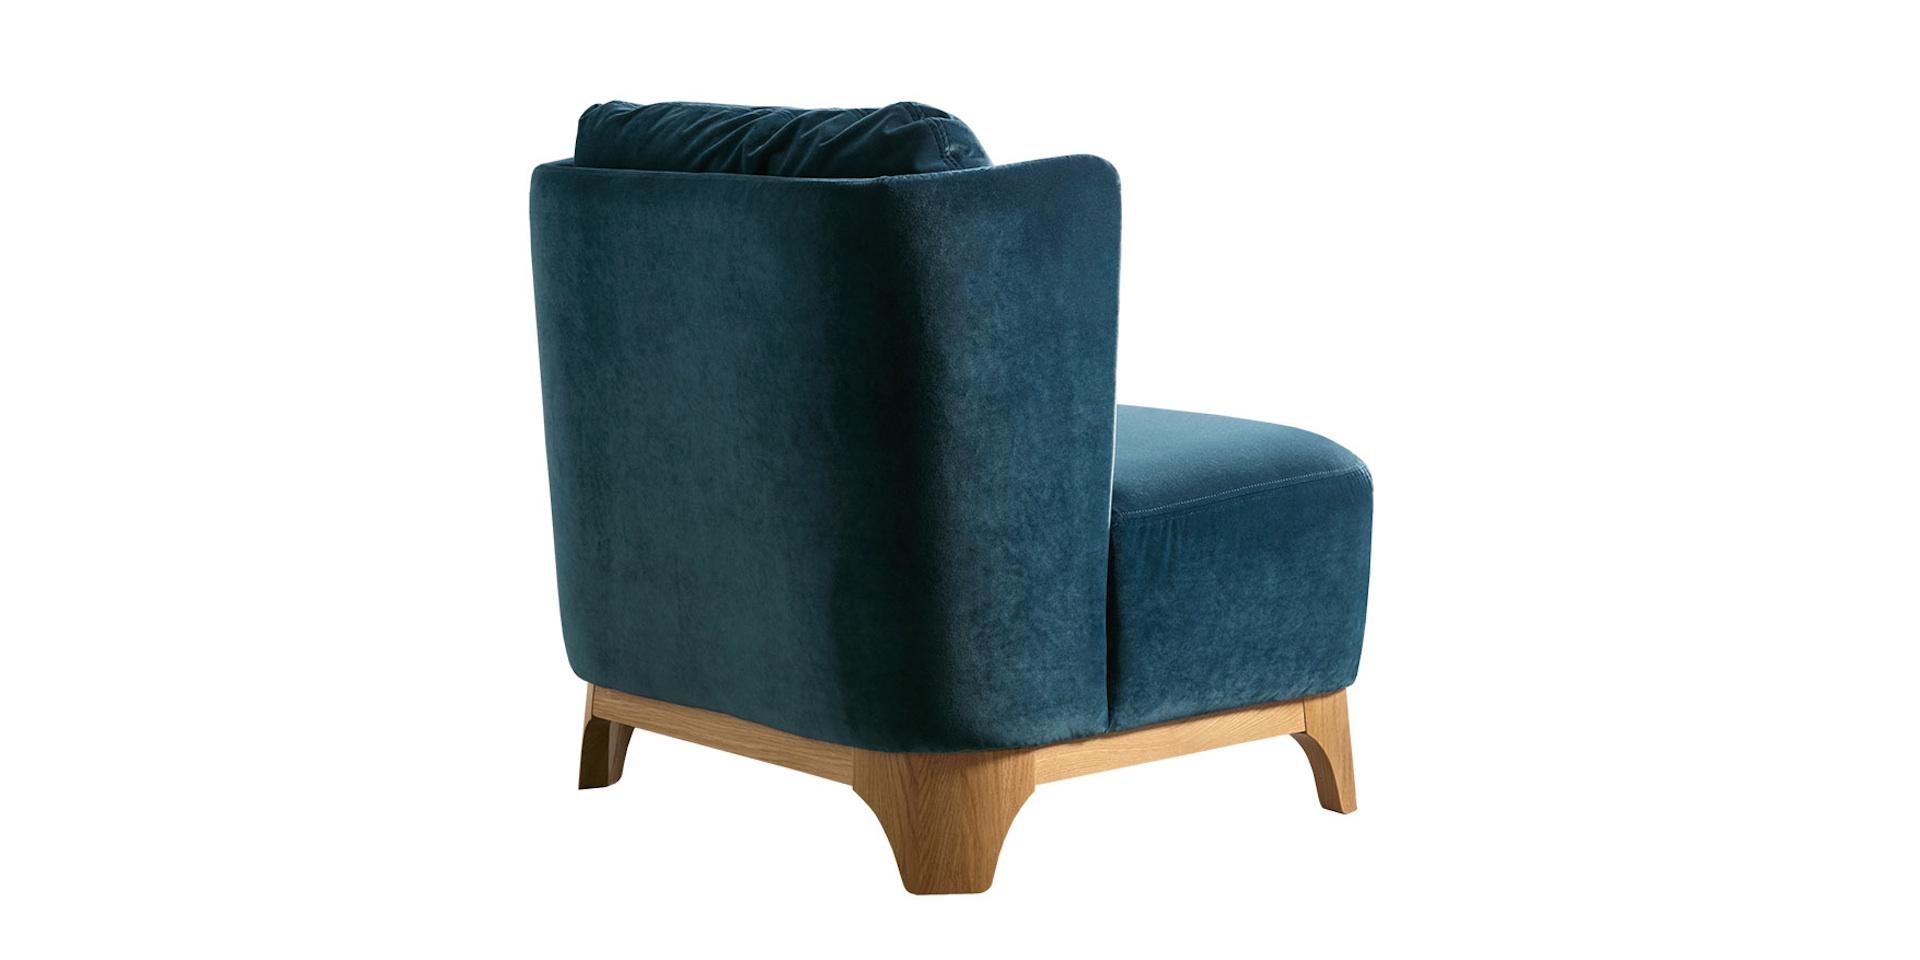 ALMA_armchair_buttons_classic_velvet12_navy_blue_5